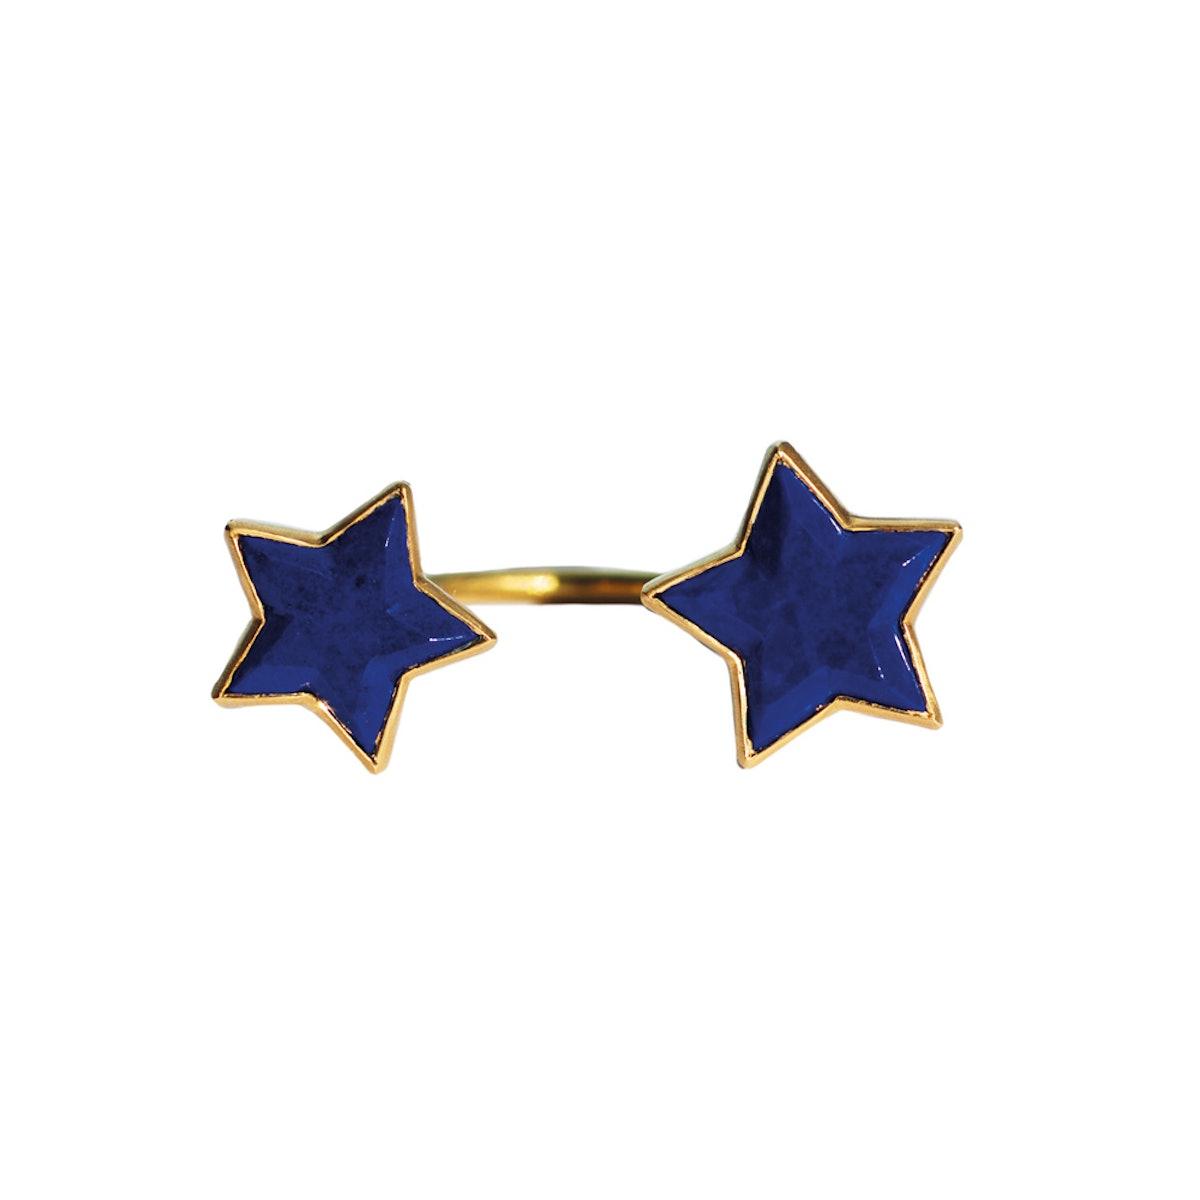 Marie-Helene-de-Taillac-ring,-$1,995,-mariehelenedetaillac